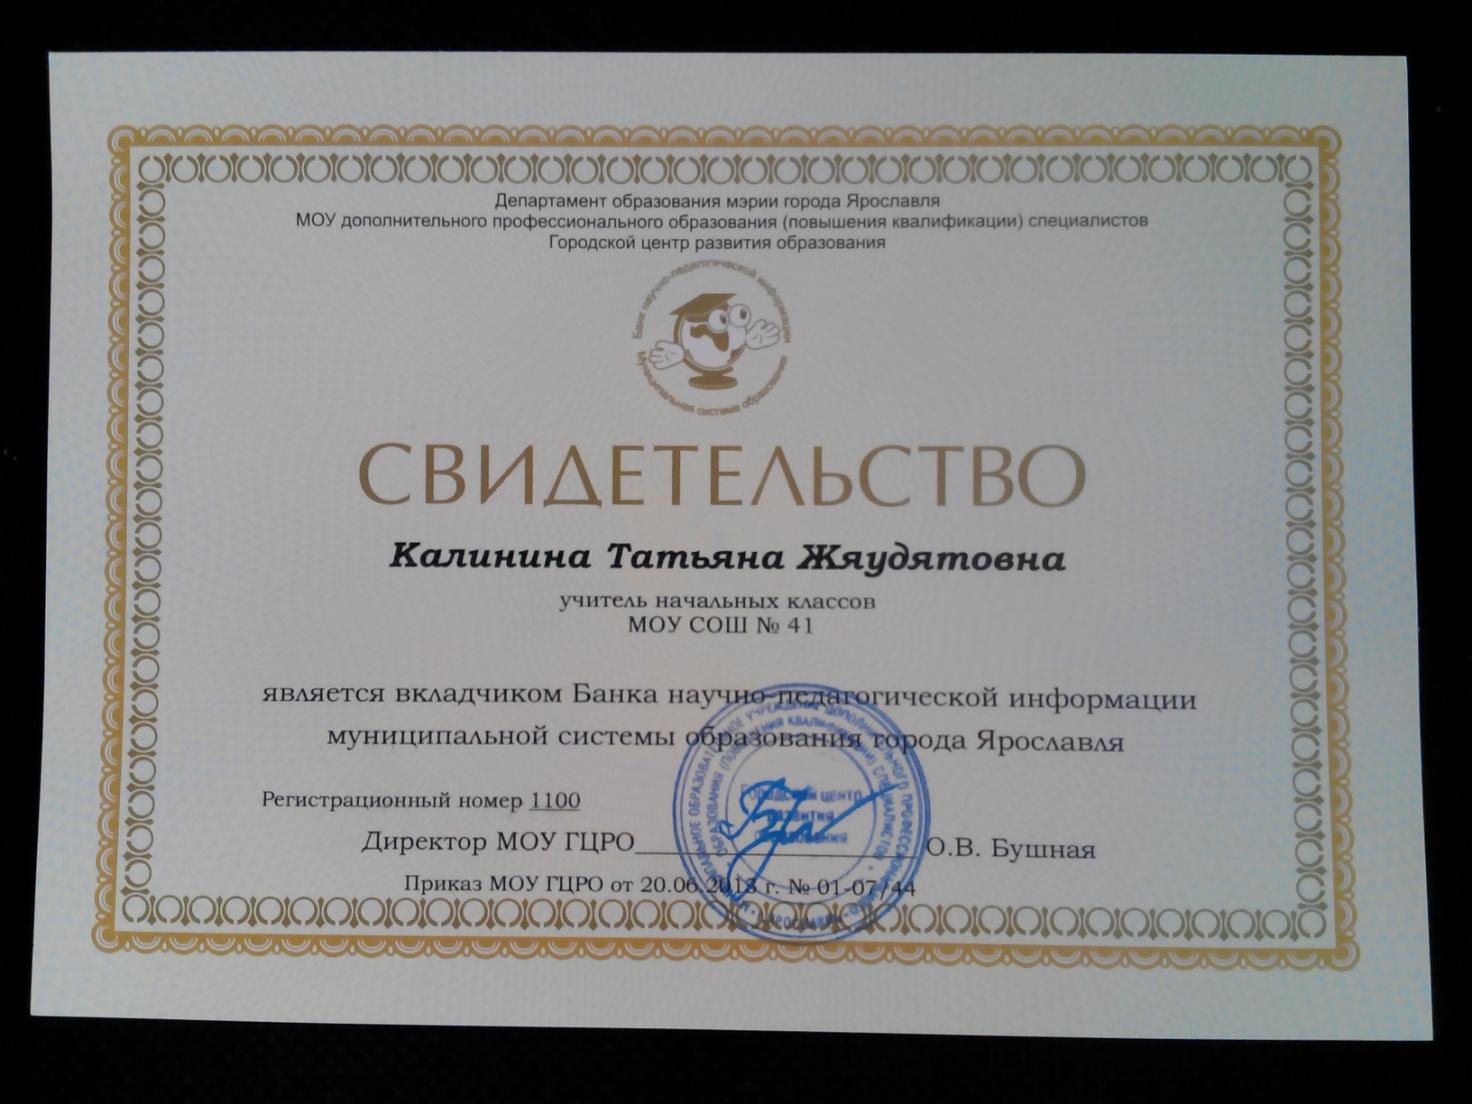 C:\Users\Татьяна\Pictures\IMG_20131014_094714.jpg